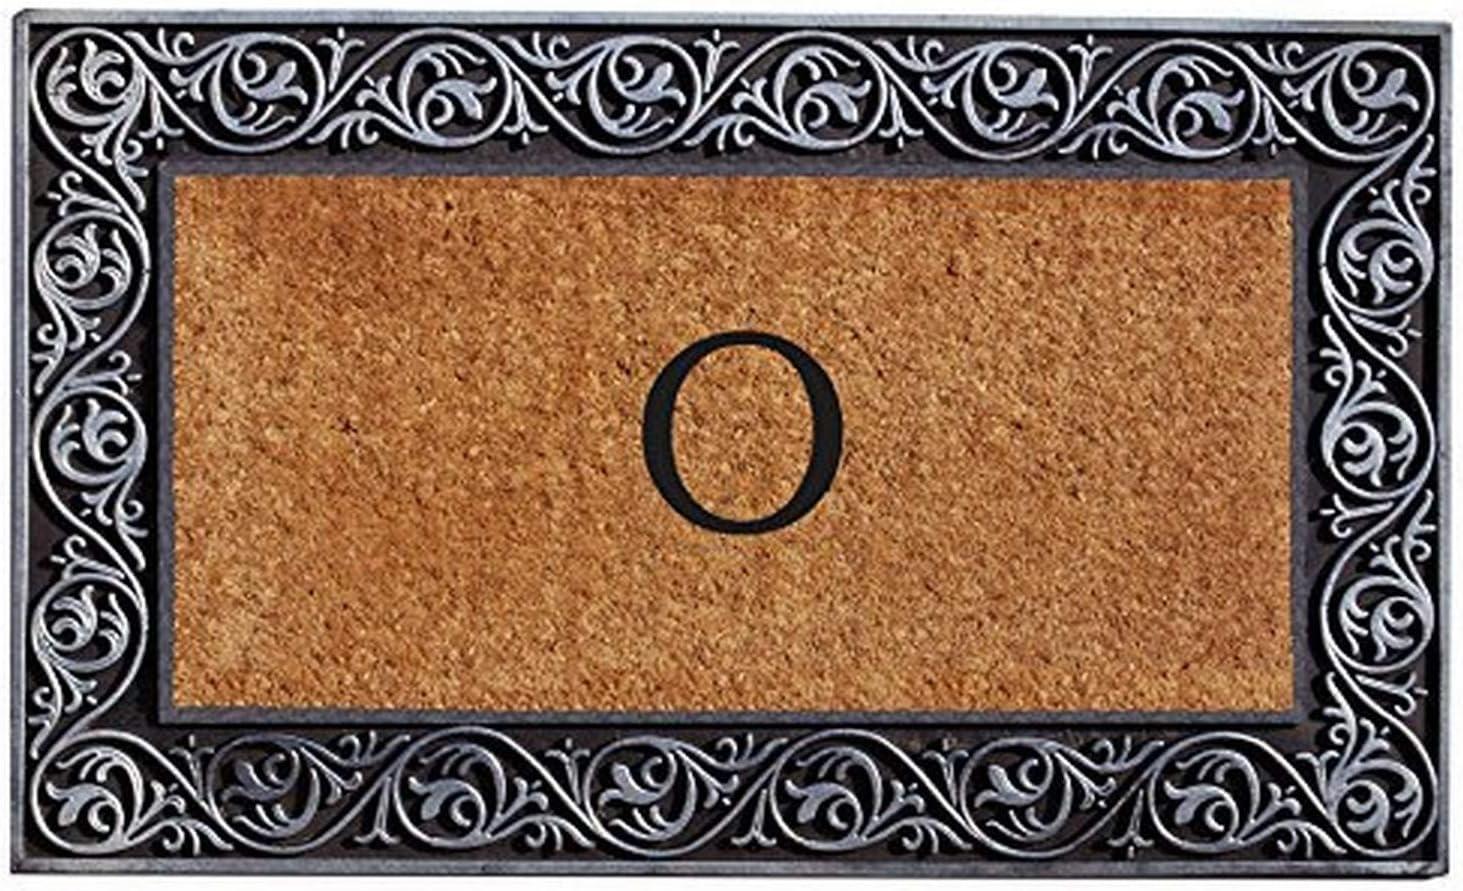 Home free More 10002SILVO Prestige Monogram Finally resale start Letter Doormat Silver